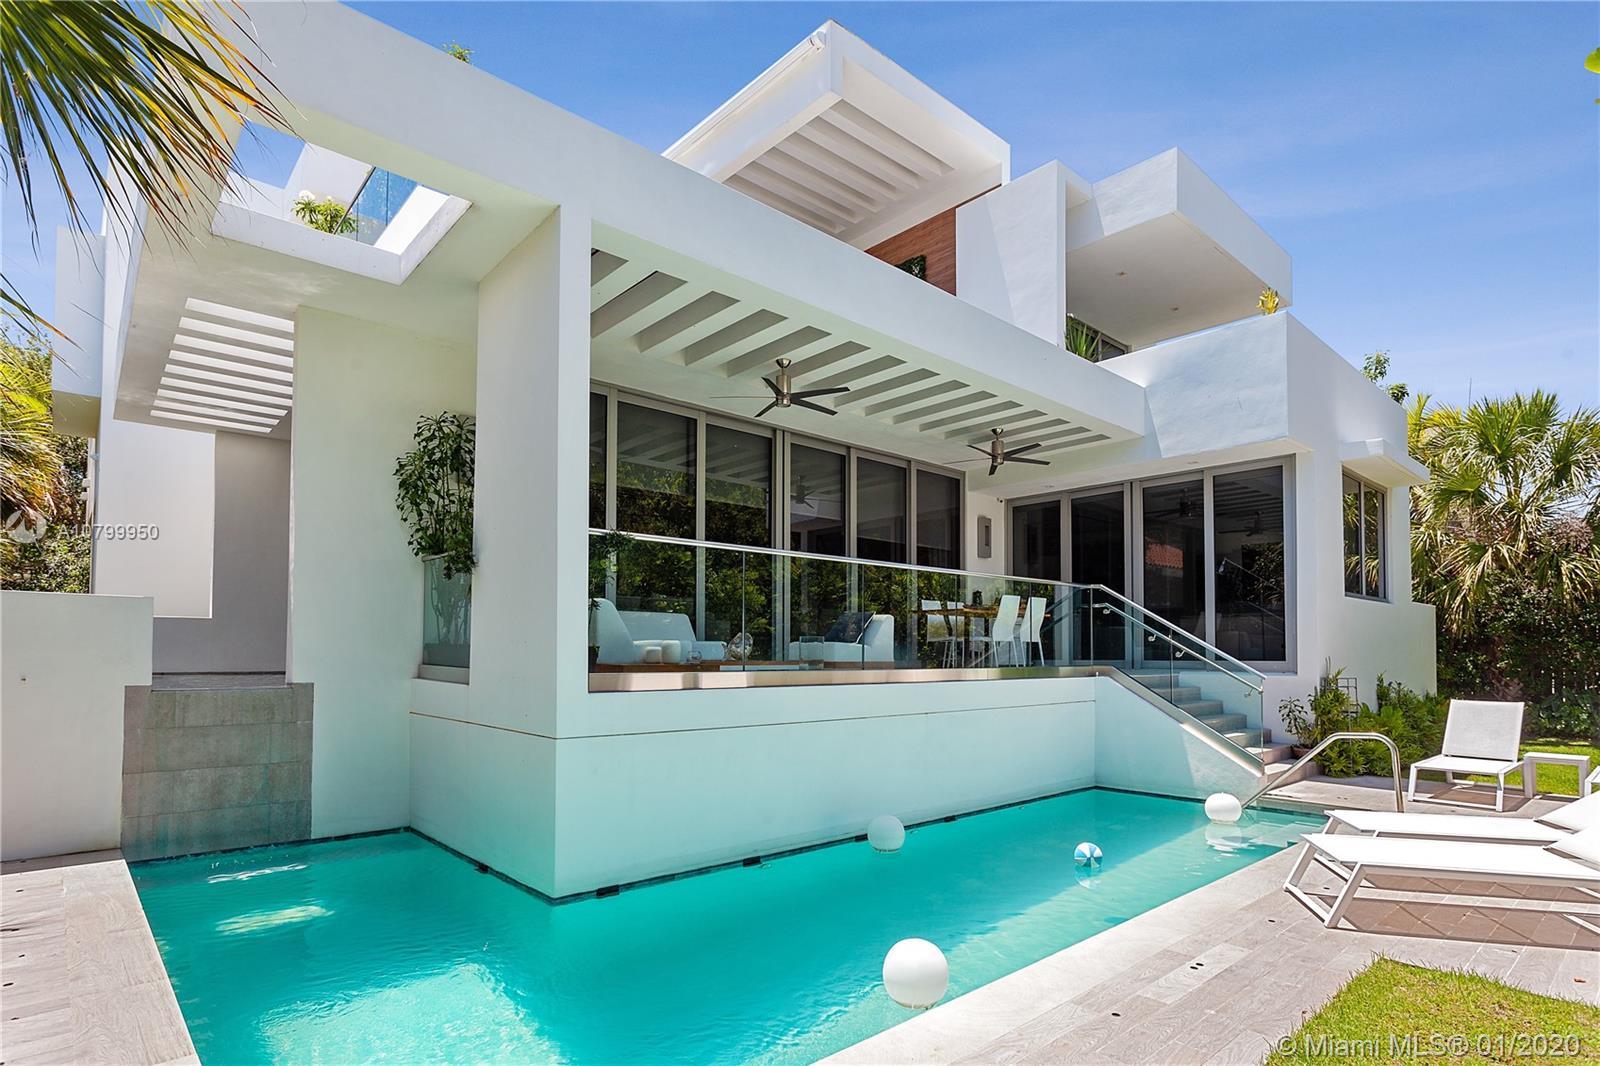 761 Glenridge Rd - Key Biscayne, Florida